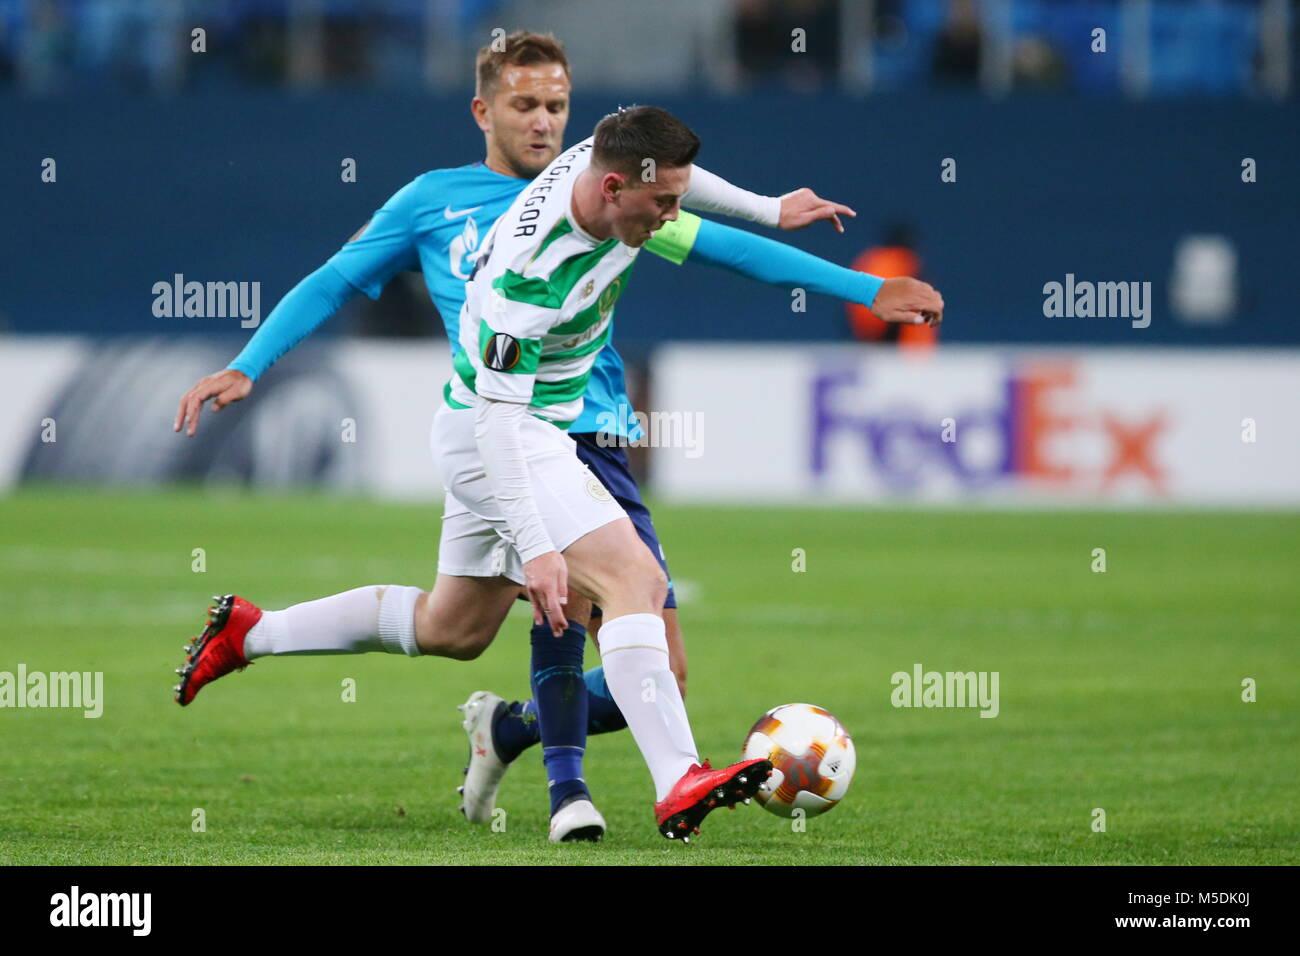 St Petersburg, Russia. 22nd Feb, 2018. ST PETERSBURG, RUSSIA - FEBRUARY 22, 2018: Celtic's Callum McGregor (front) - Stock Image